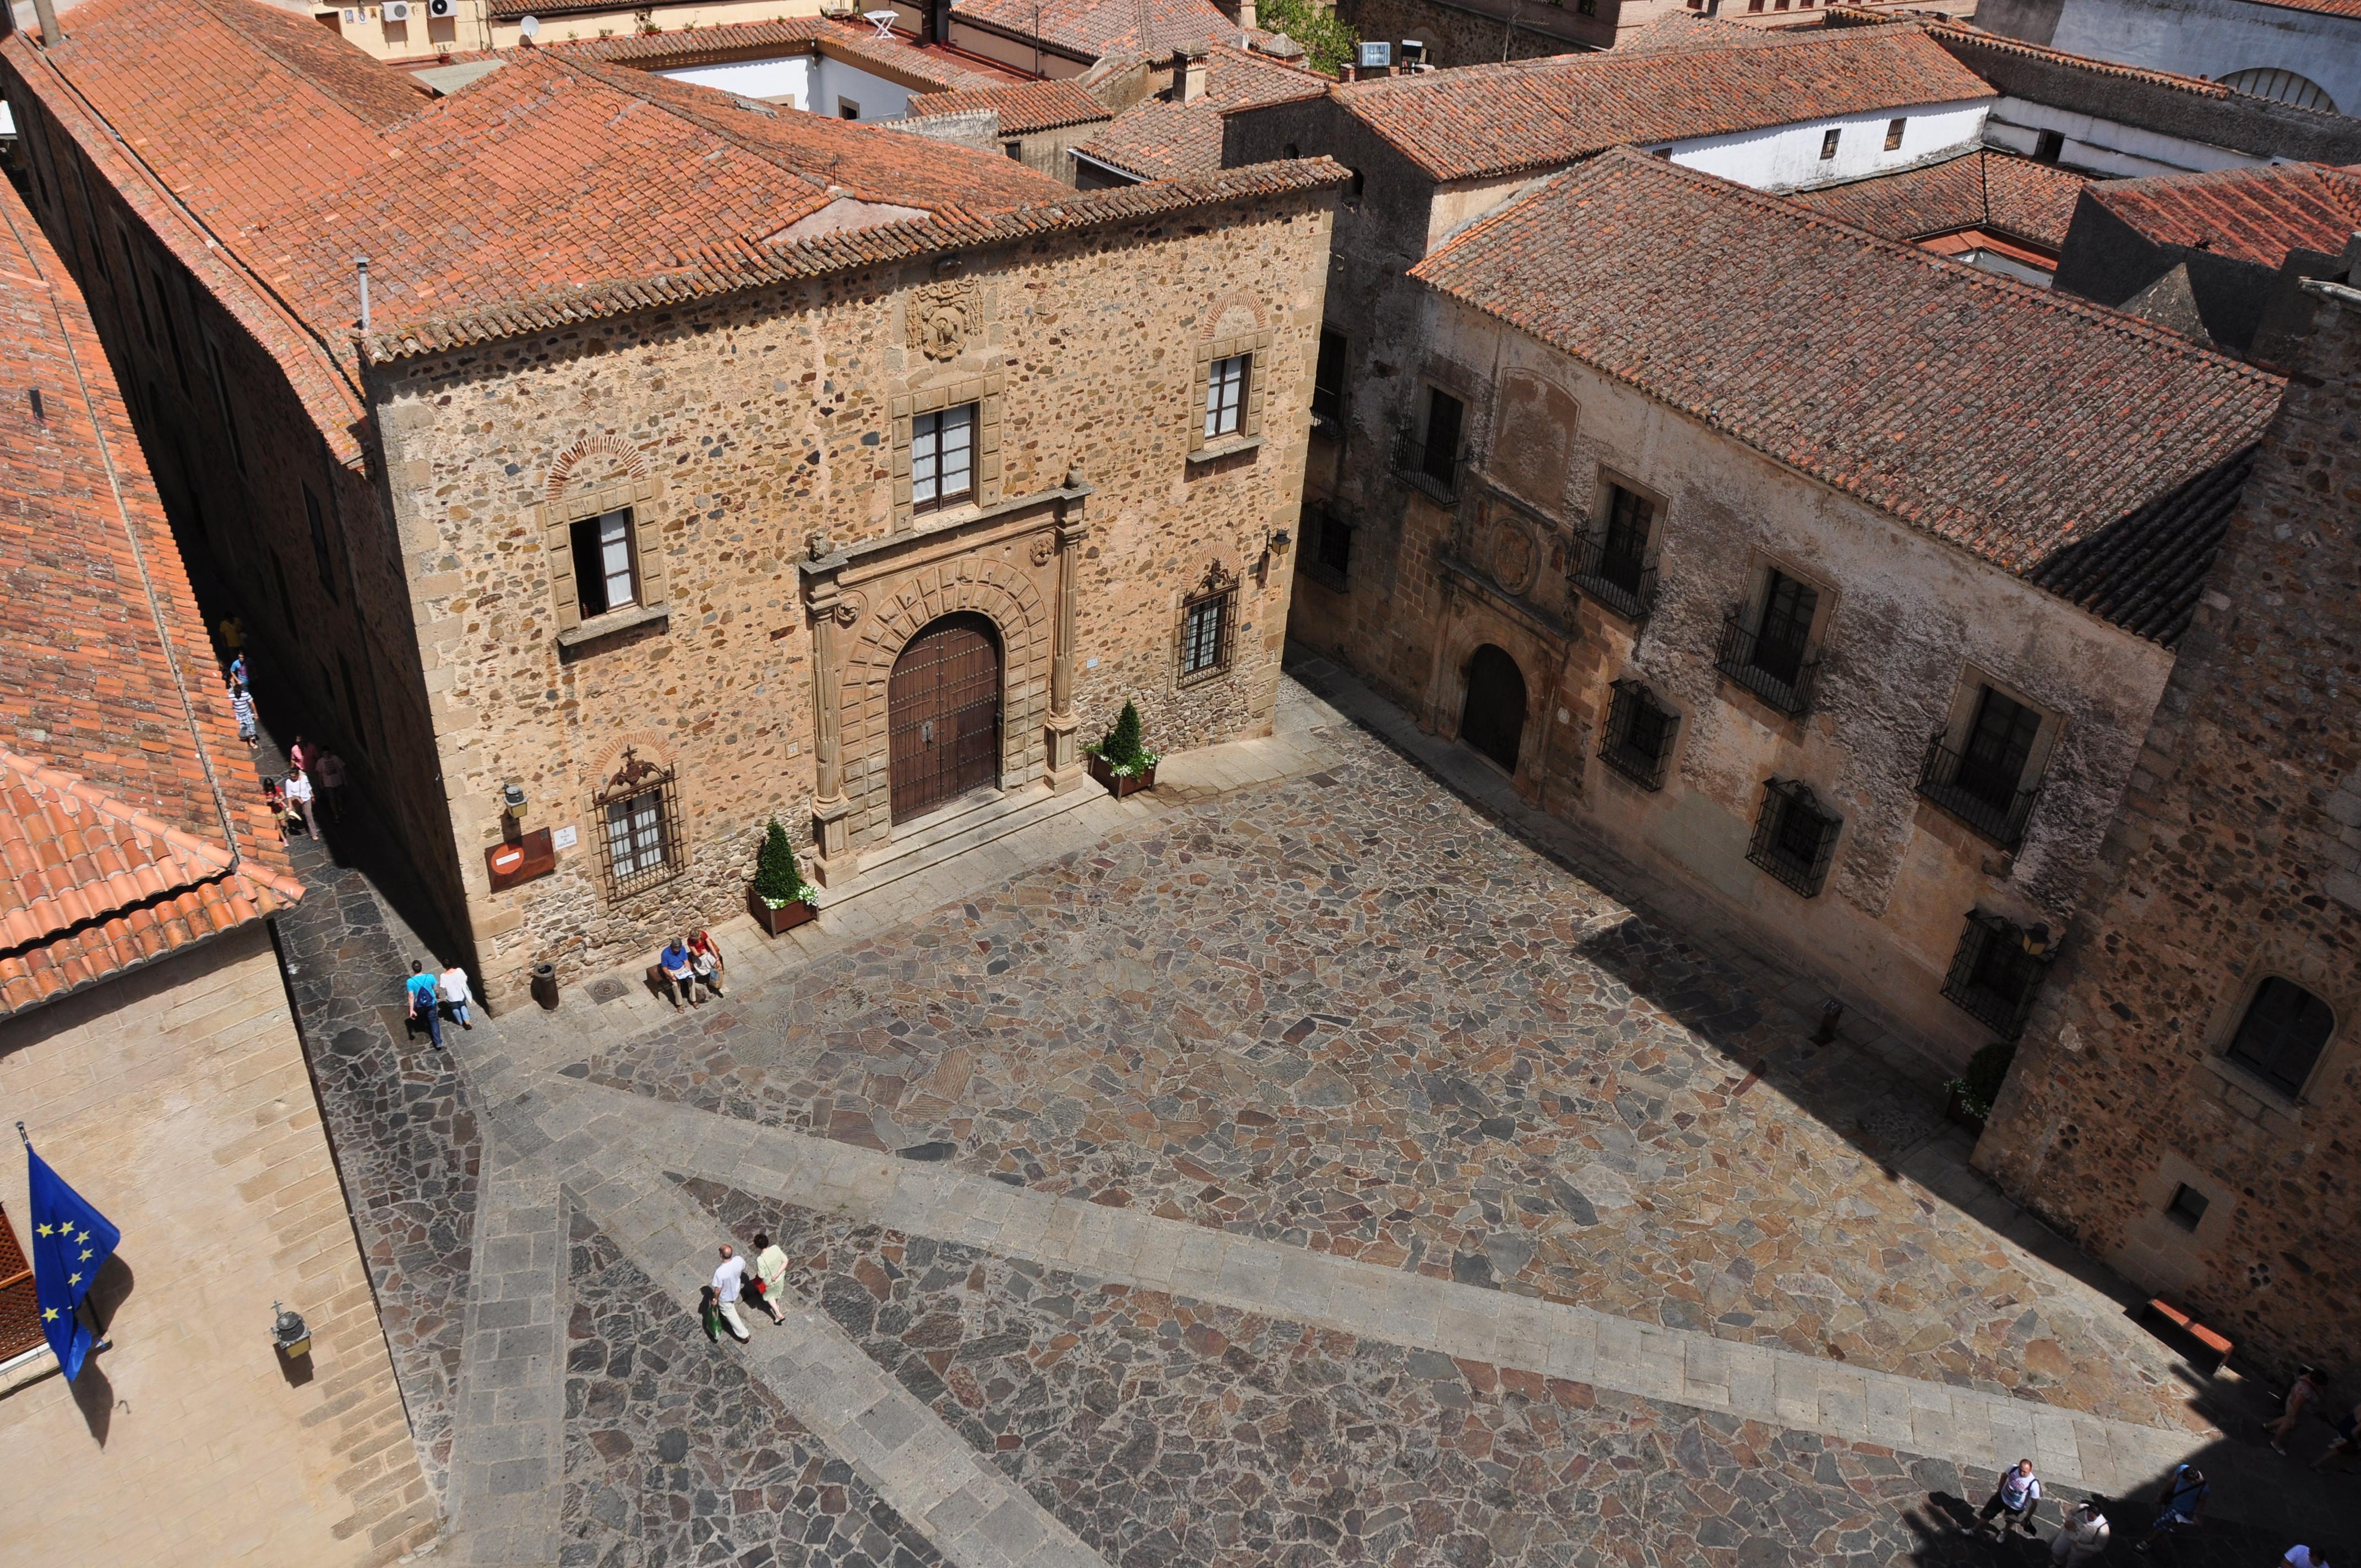 File:Plaza de Santa María, Cáceres.JPG - Wikimedia Commons